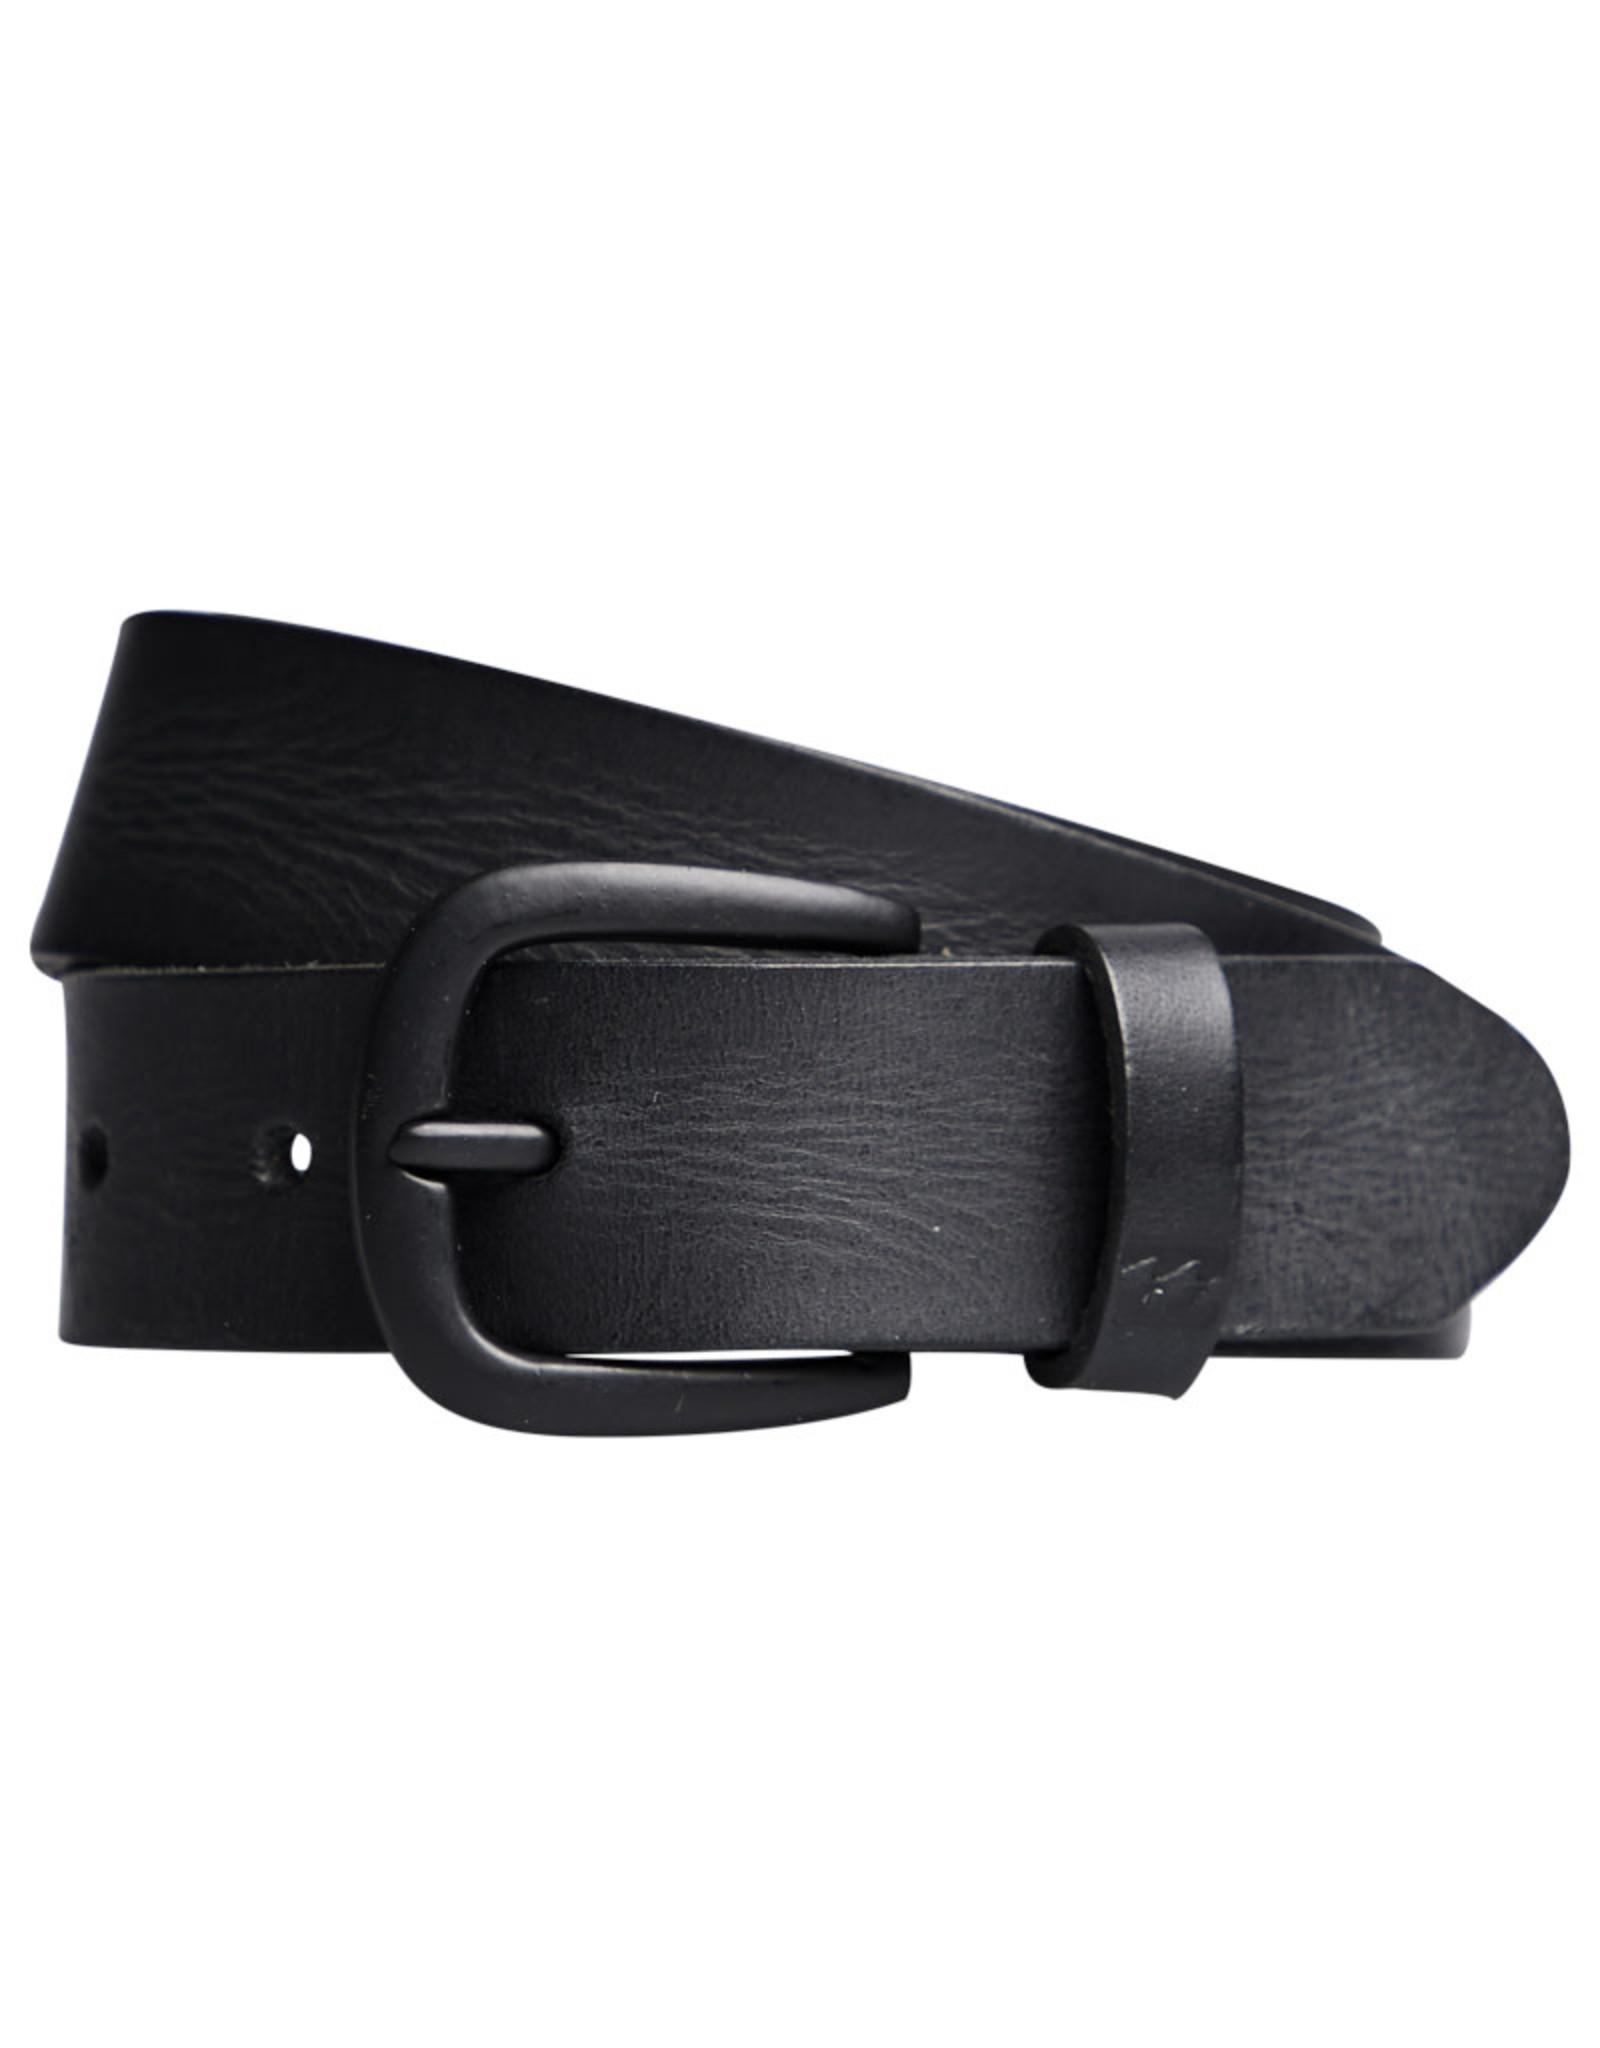 Billabong Billabong All Day Leather Belt Black